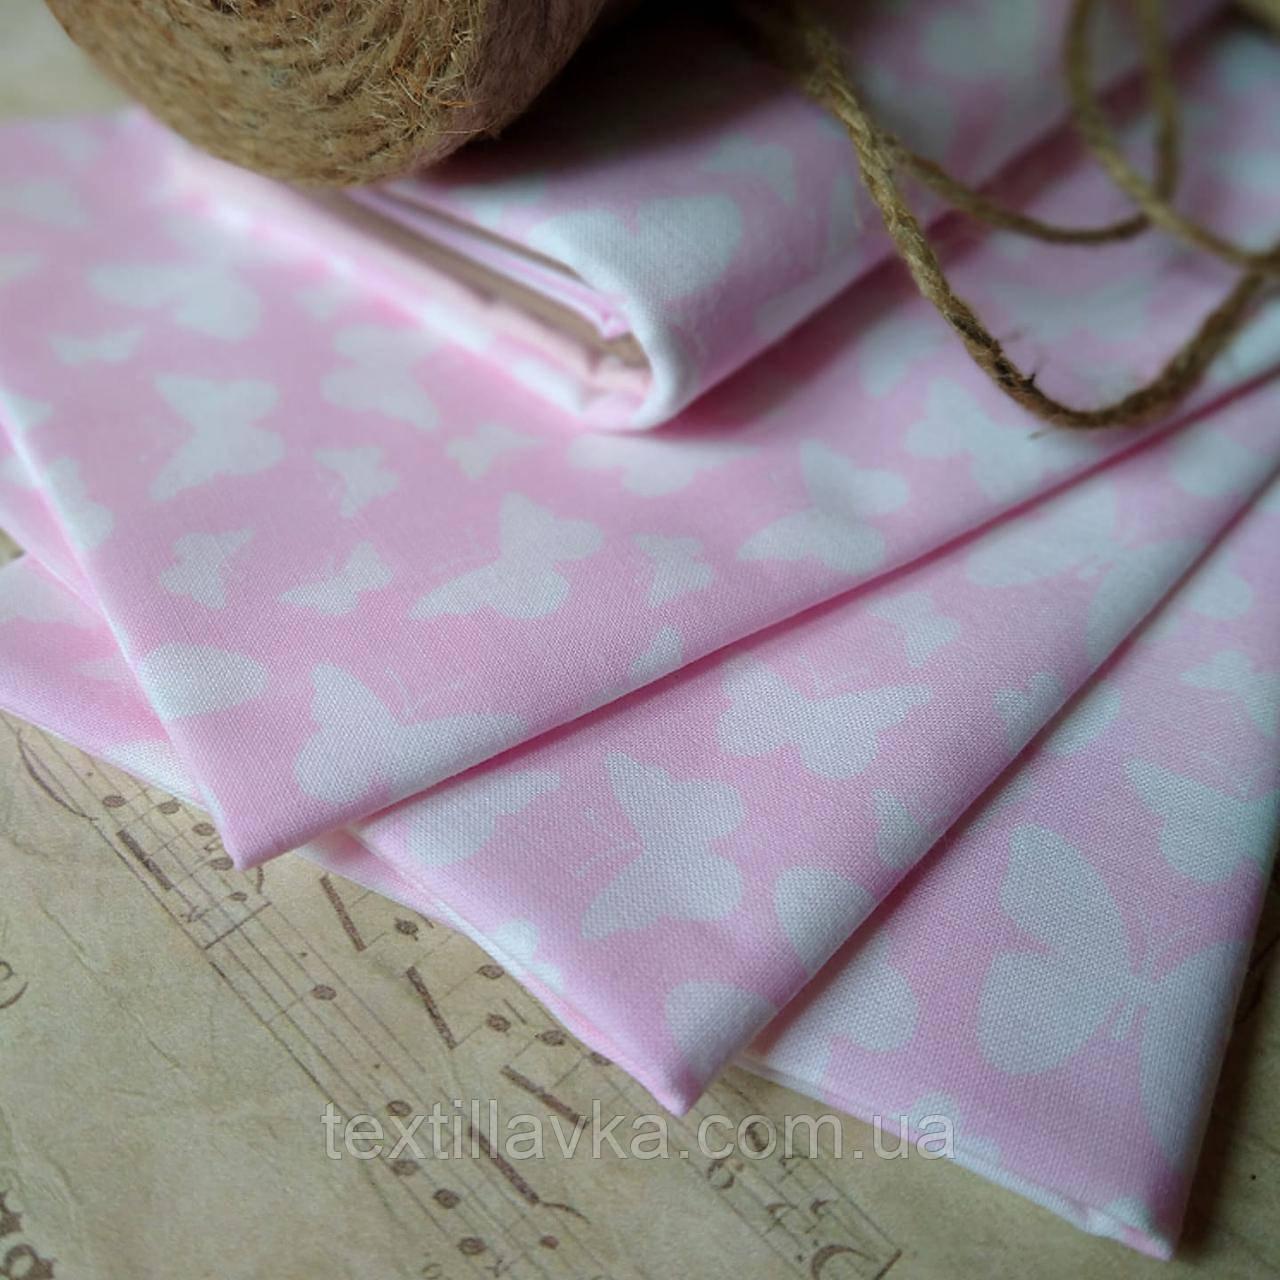 Ткань хлопок для рукоделия бабочки на розовом